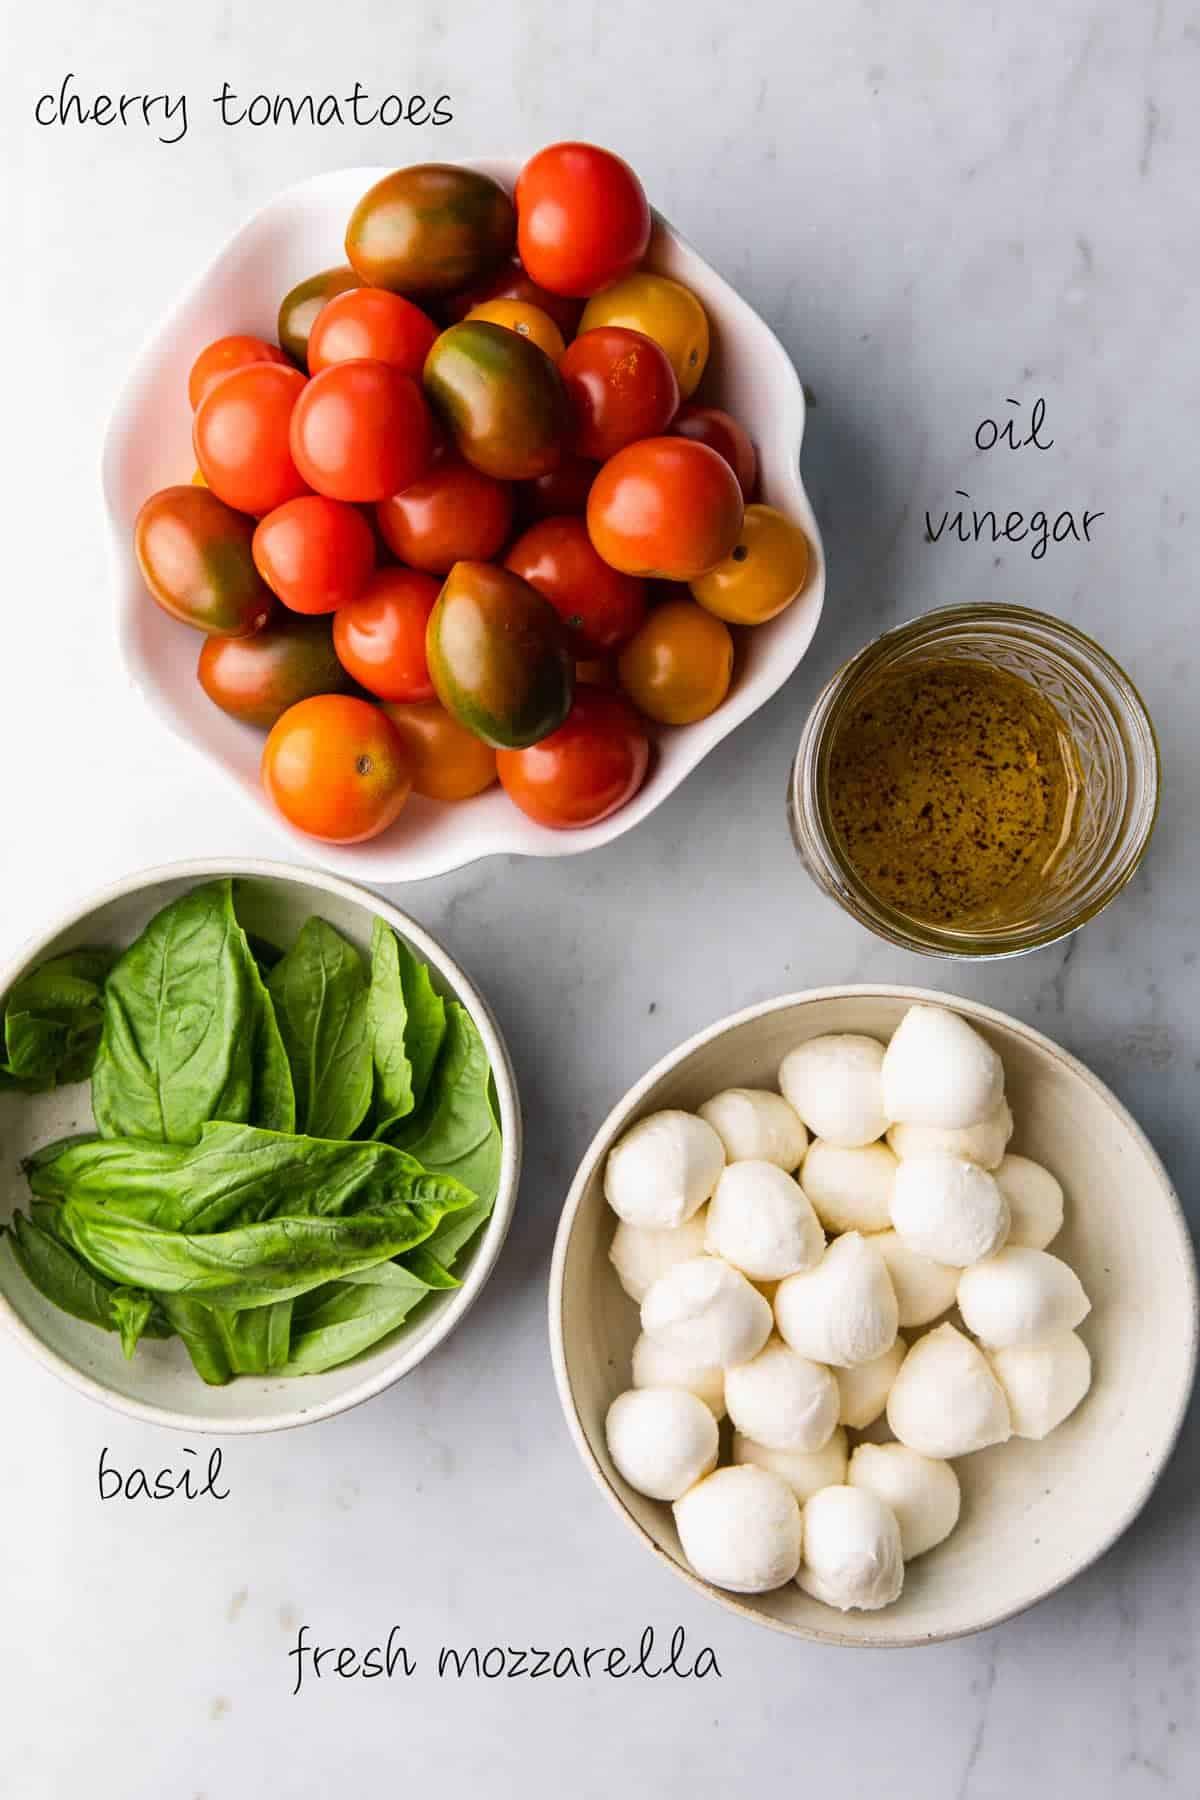 cherry tomatoes, mozzarella balls, olive oil dressing